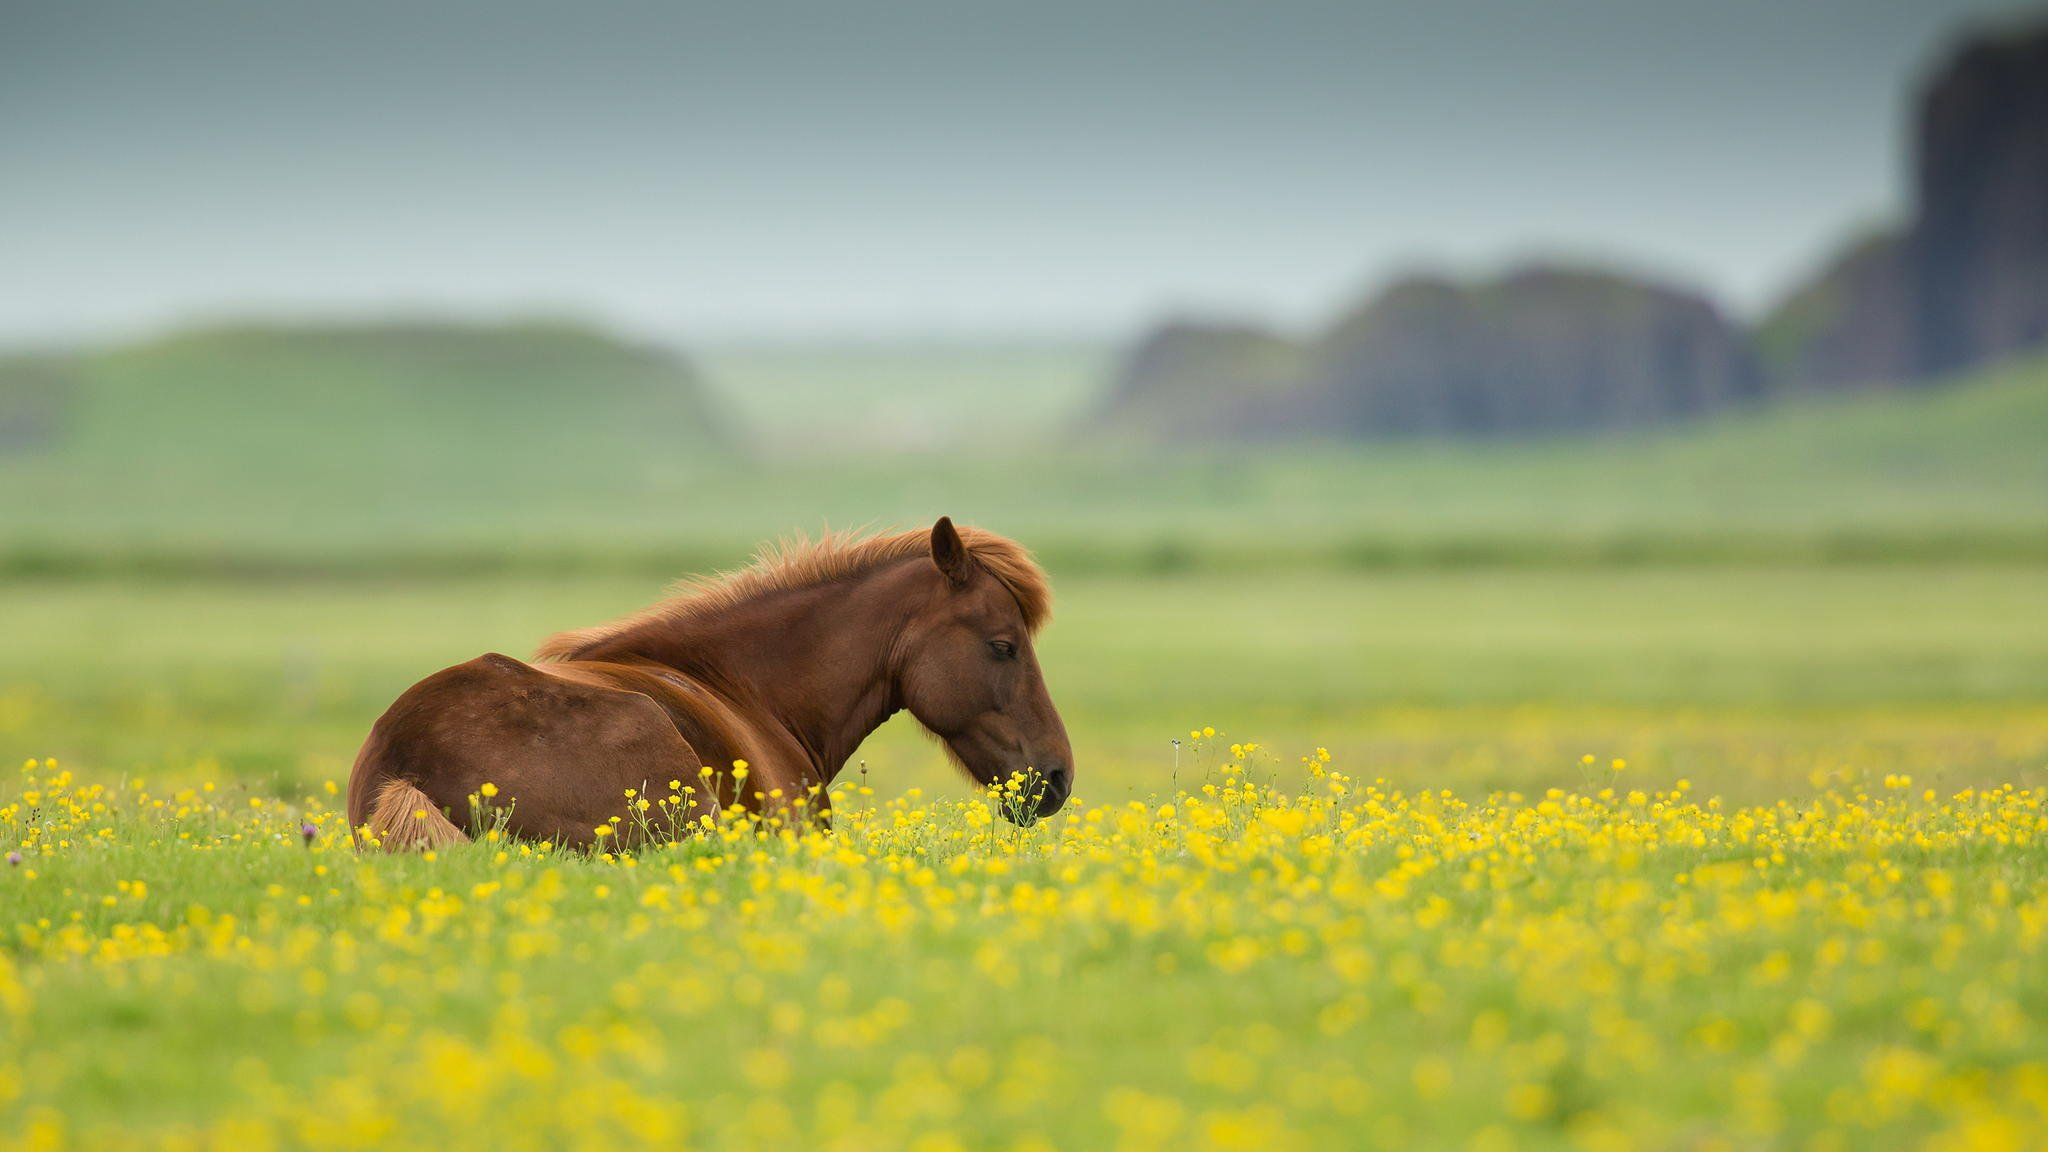 Horse Nature Animal Field Summer Flowers Wallpaper